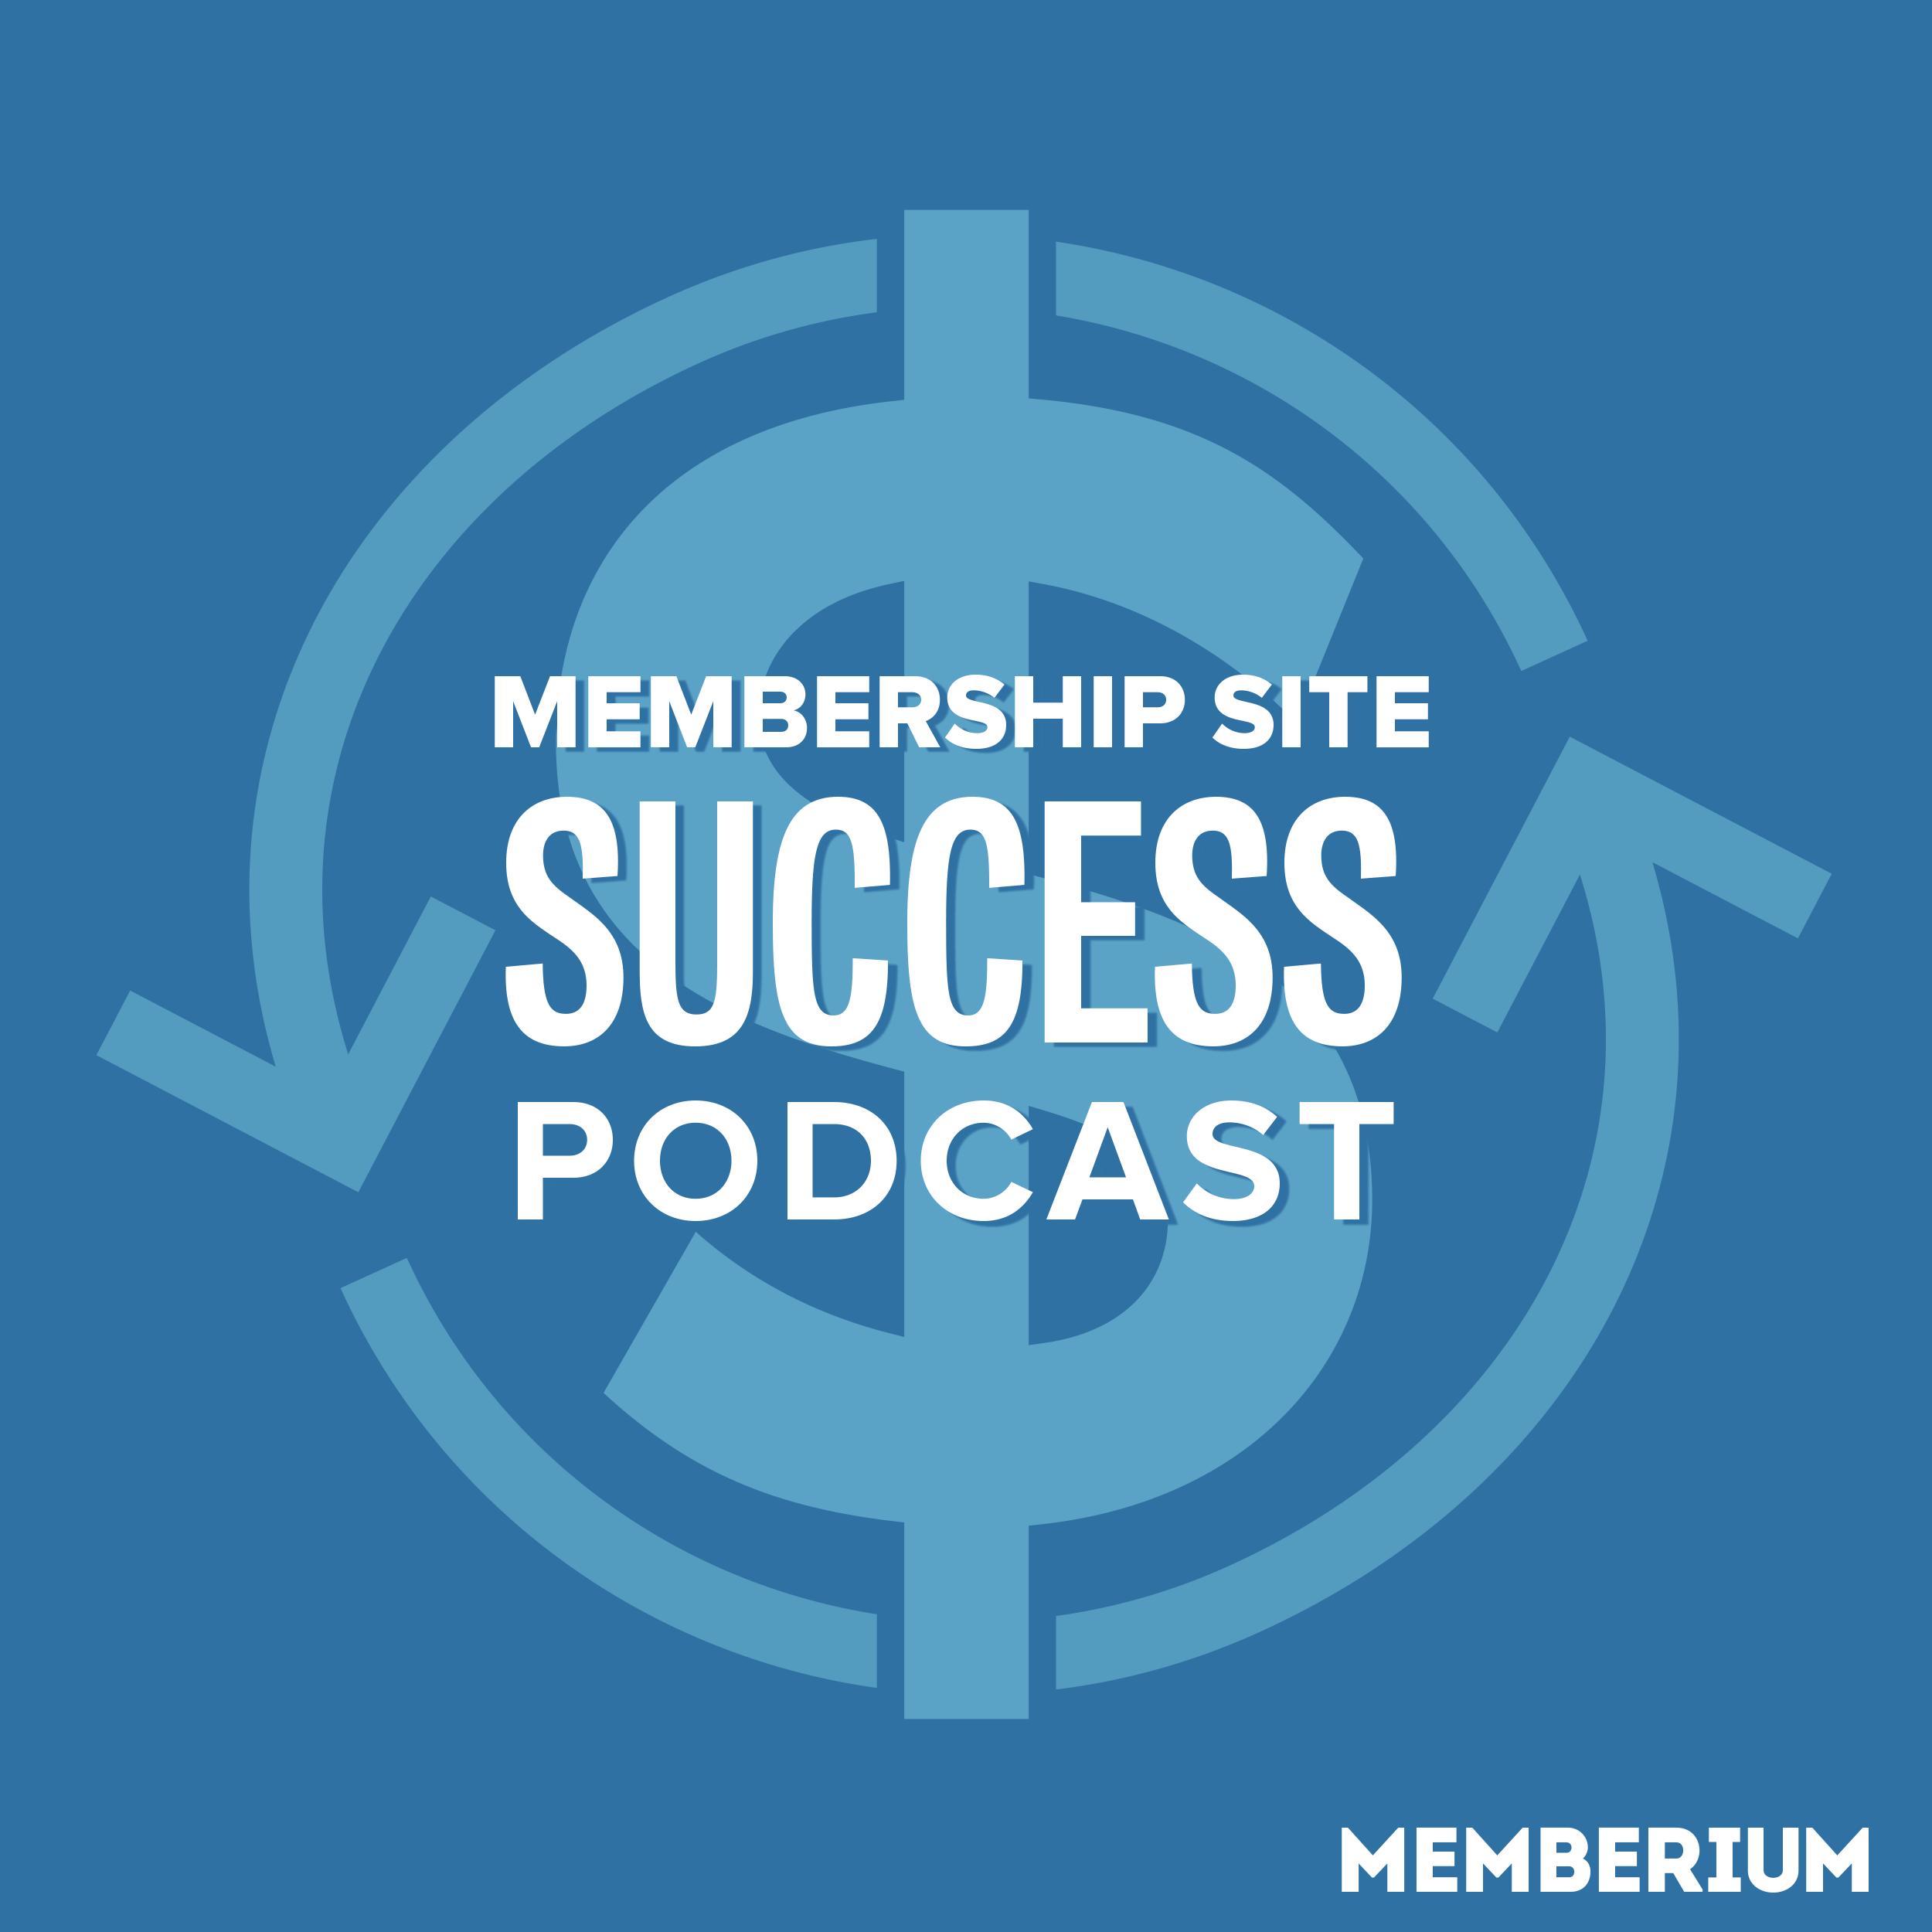 Membership Site Success Podcast show art